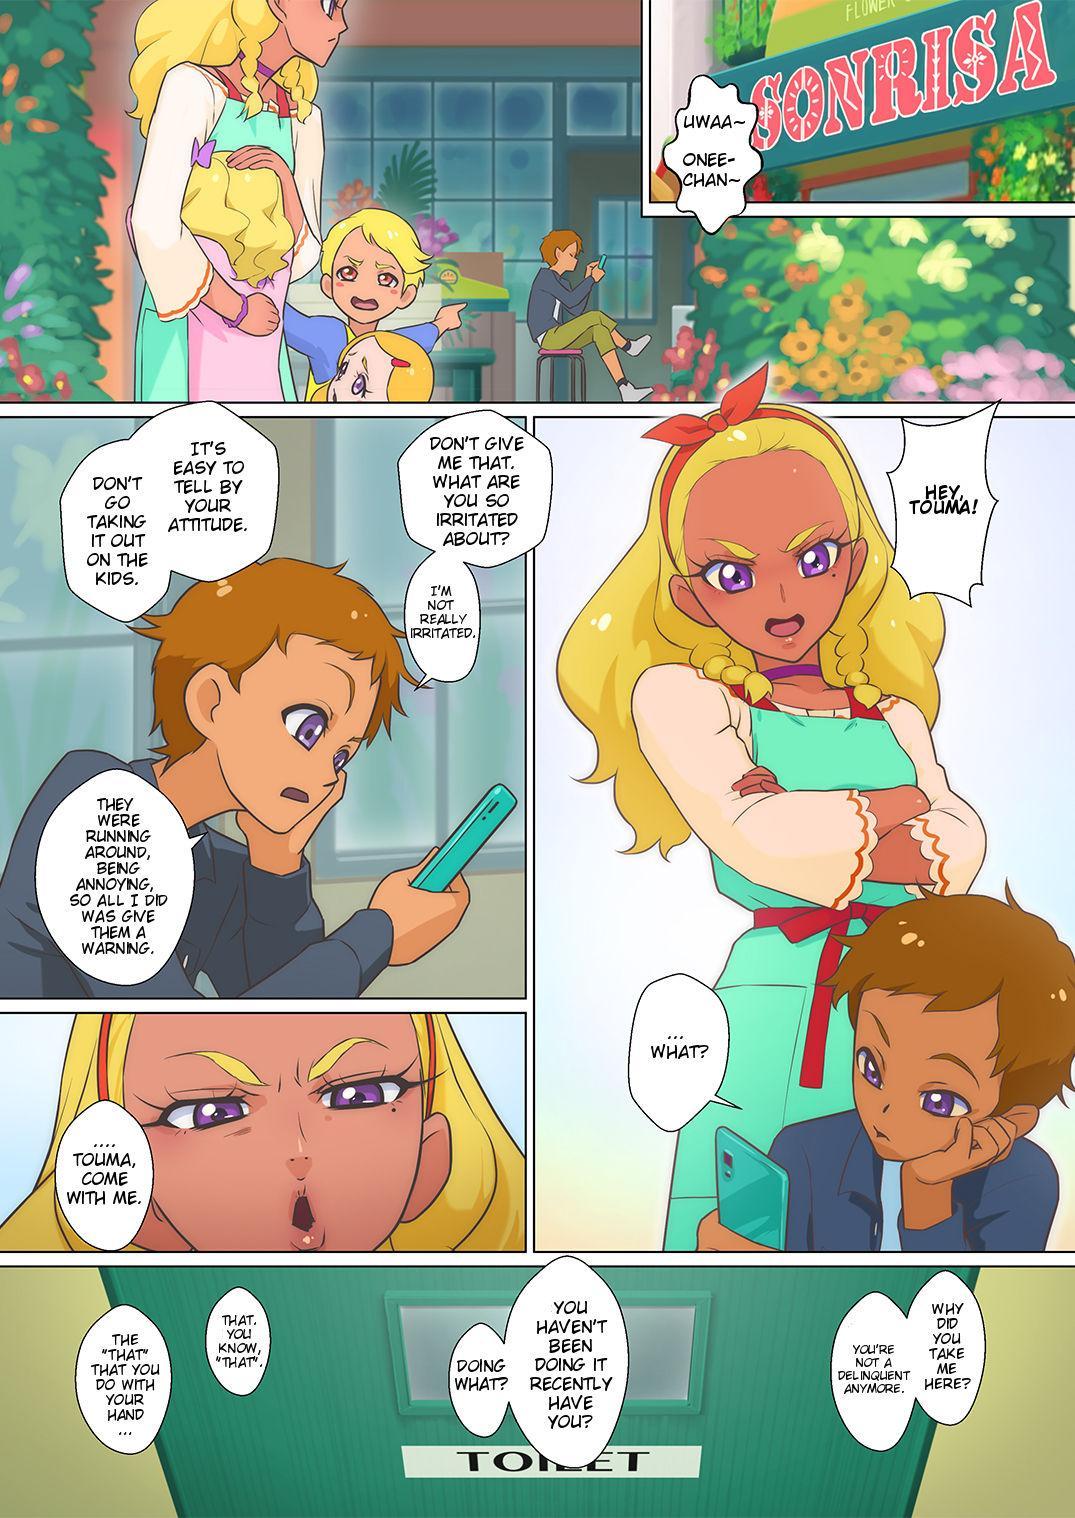 Amamiya-ke no Katei no Jijou | The Amamiya Family Circumstances 2